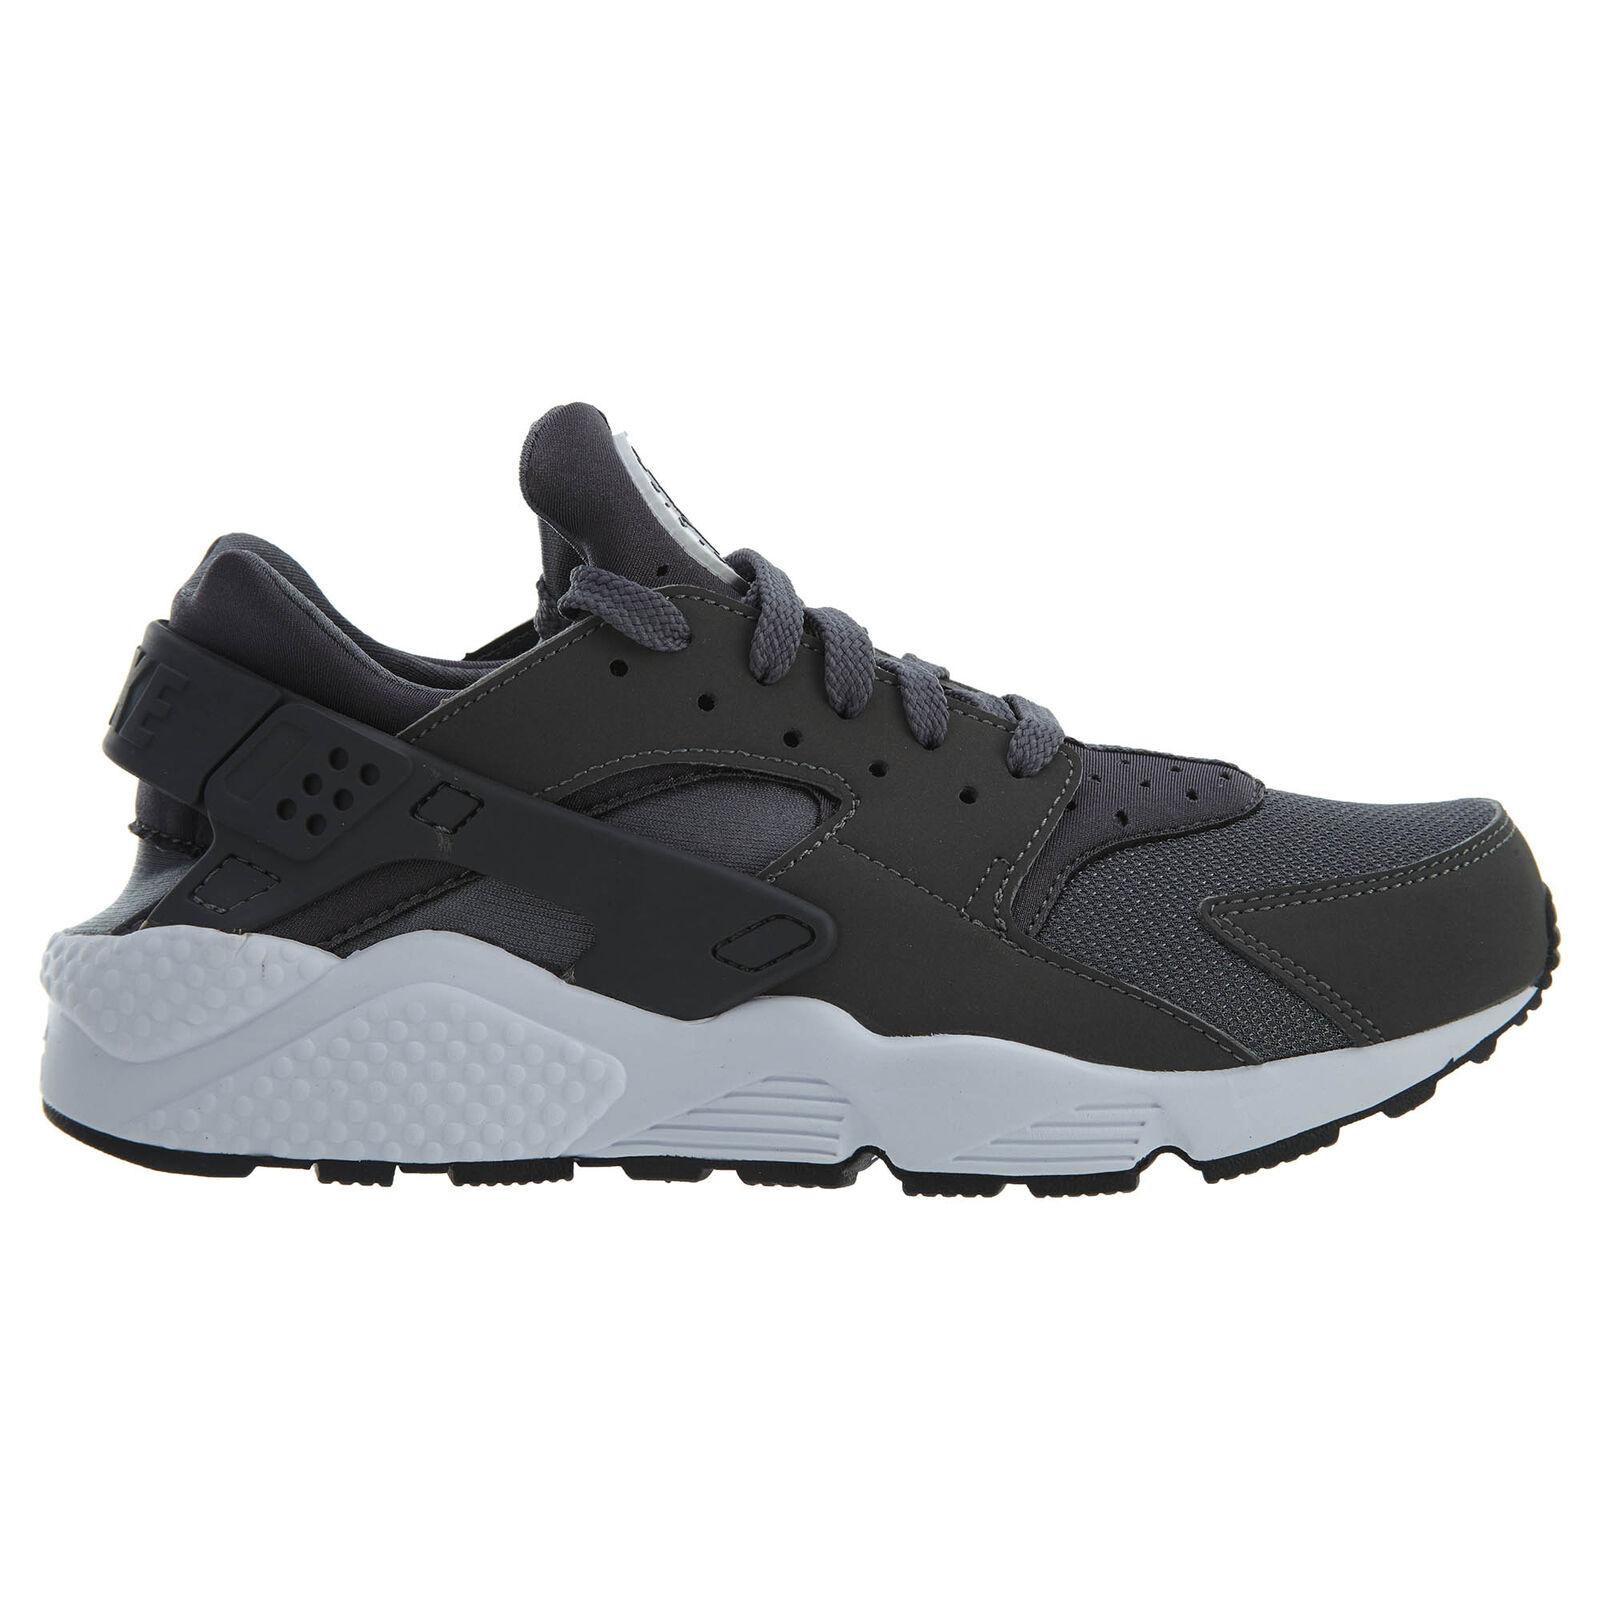 Nike Air Huarache Mens Mens Mens 318429-037 Dark Grey Athletic Running shoes Size 11 2785fe